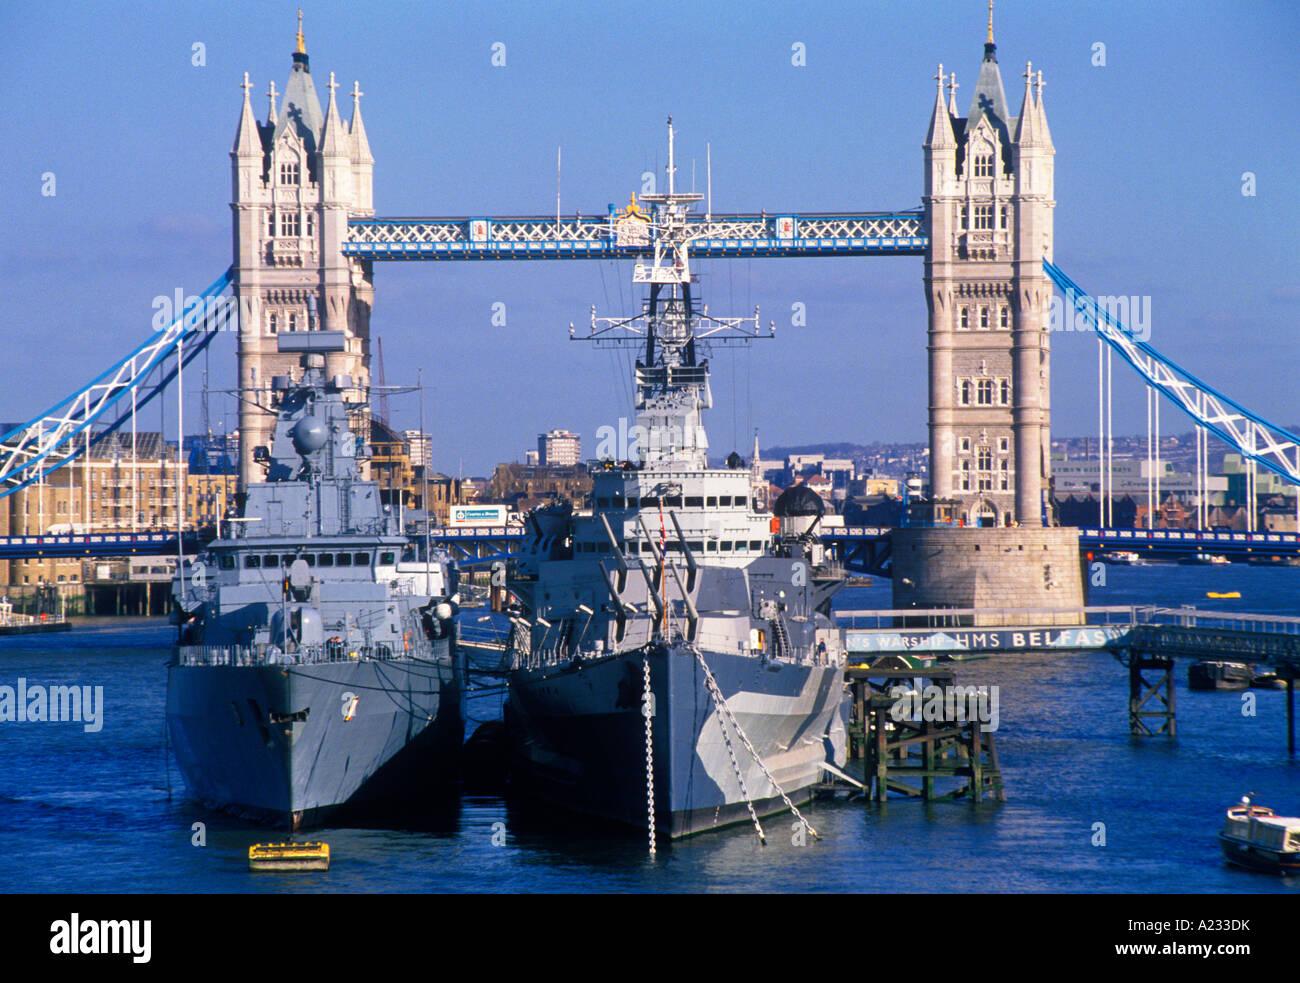 England UK London England Historic Tower Bridge on the Thames River Two Navy Battleships Moored Europe - Stock Image